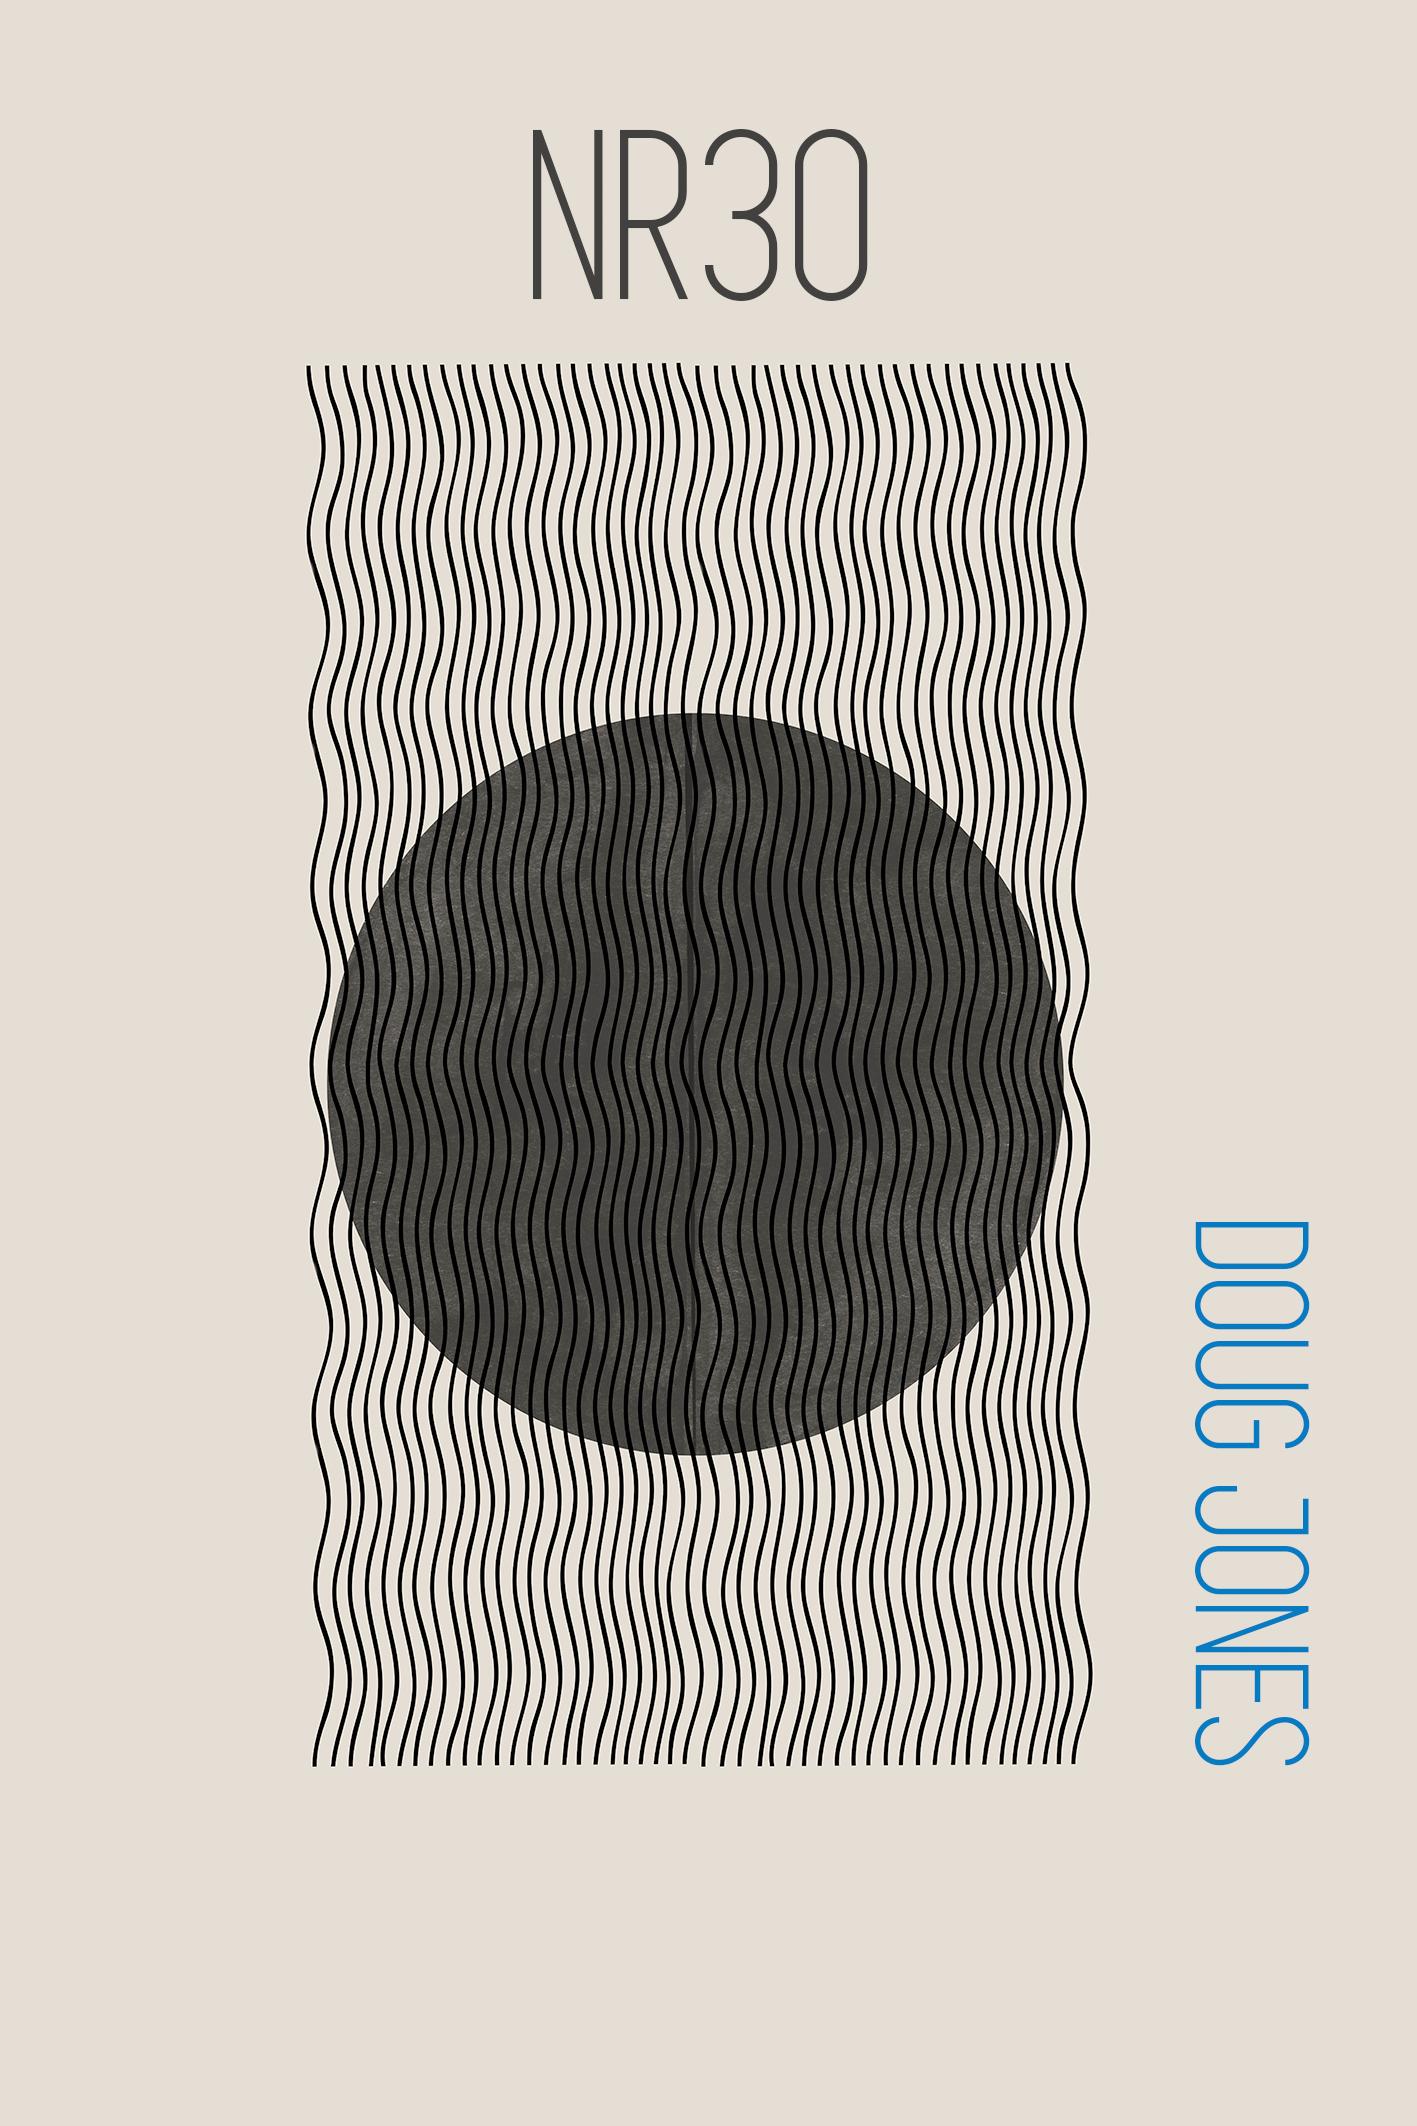 NR30 - Doug Jones